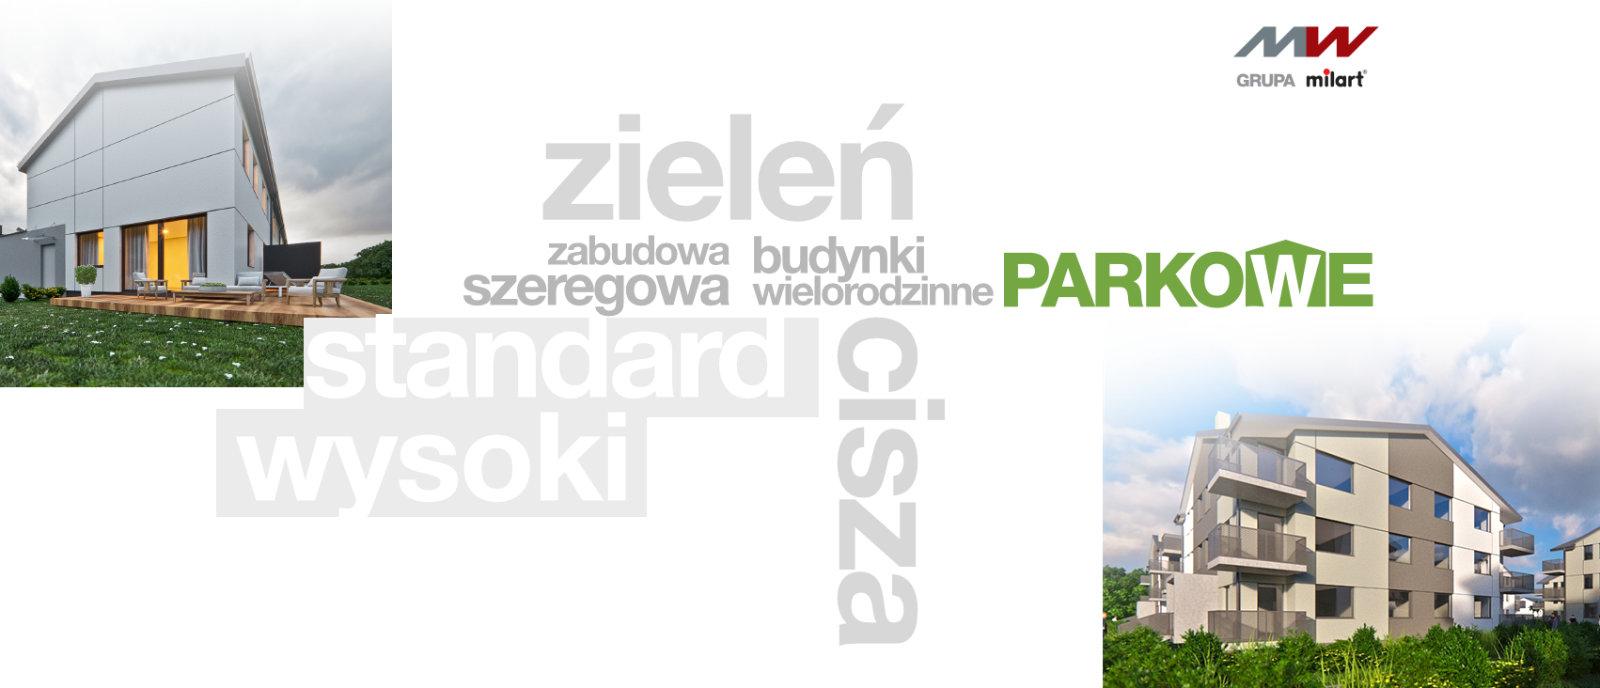 Parkowe Radwanice